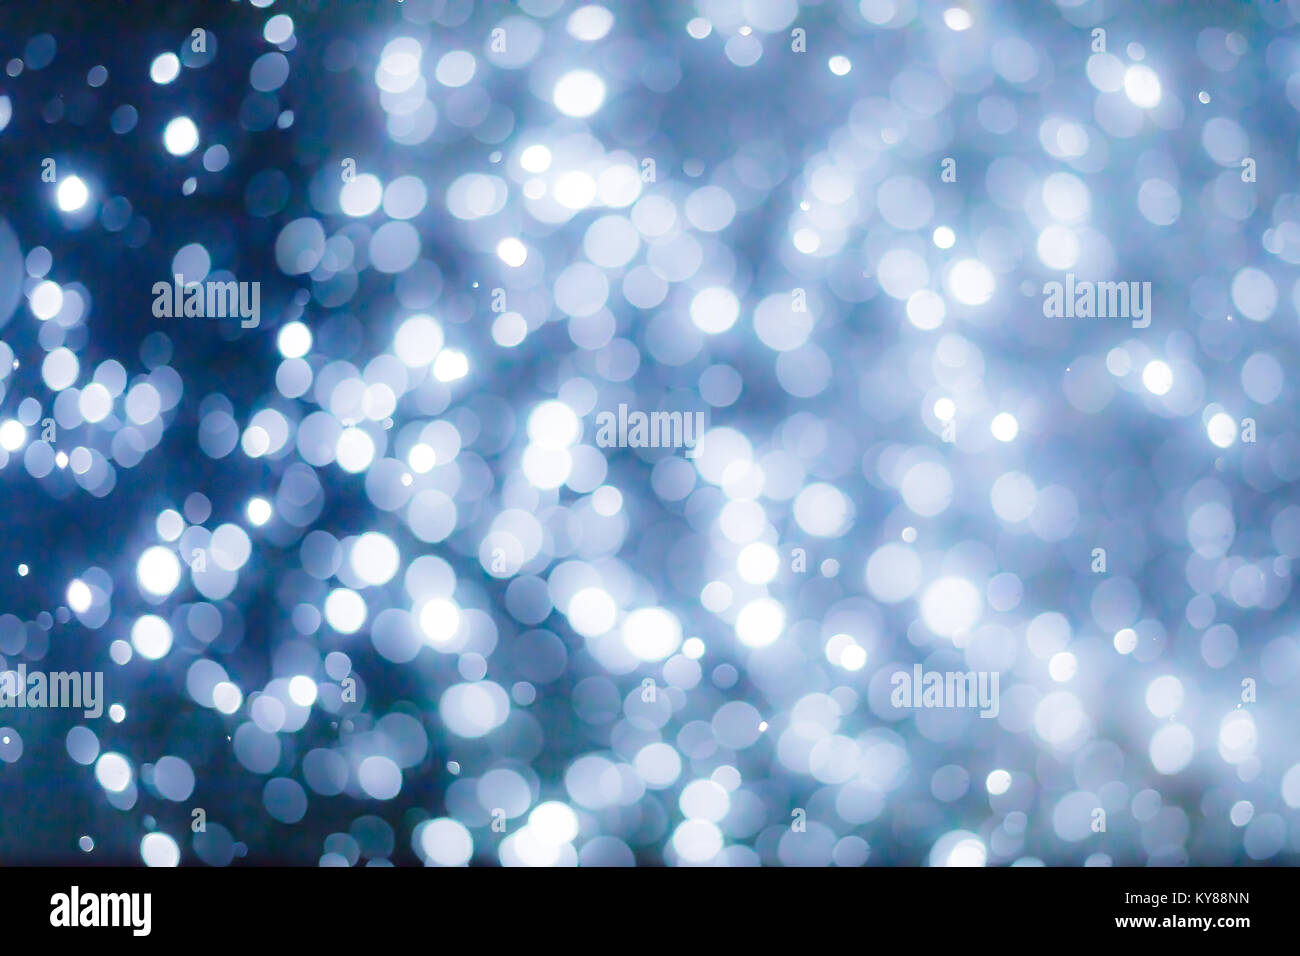 Bokeh Lights leaks 370 Snowflake Silver Bokeh Photo Overlays Green Bokeh